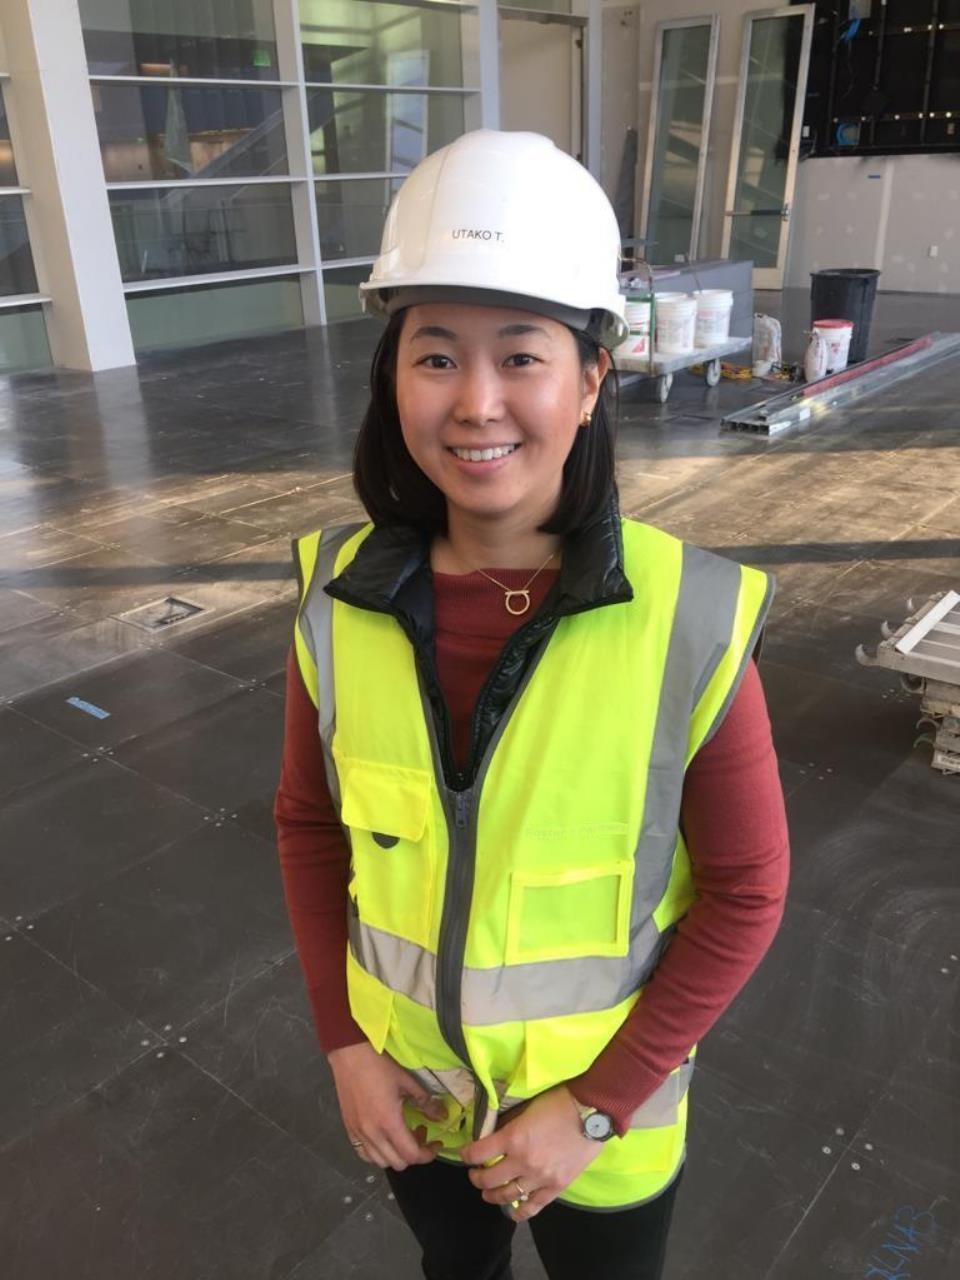 Utako on site in December 2018